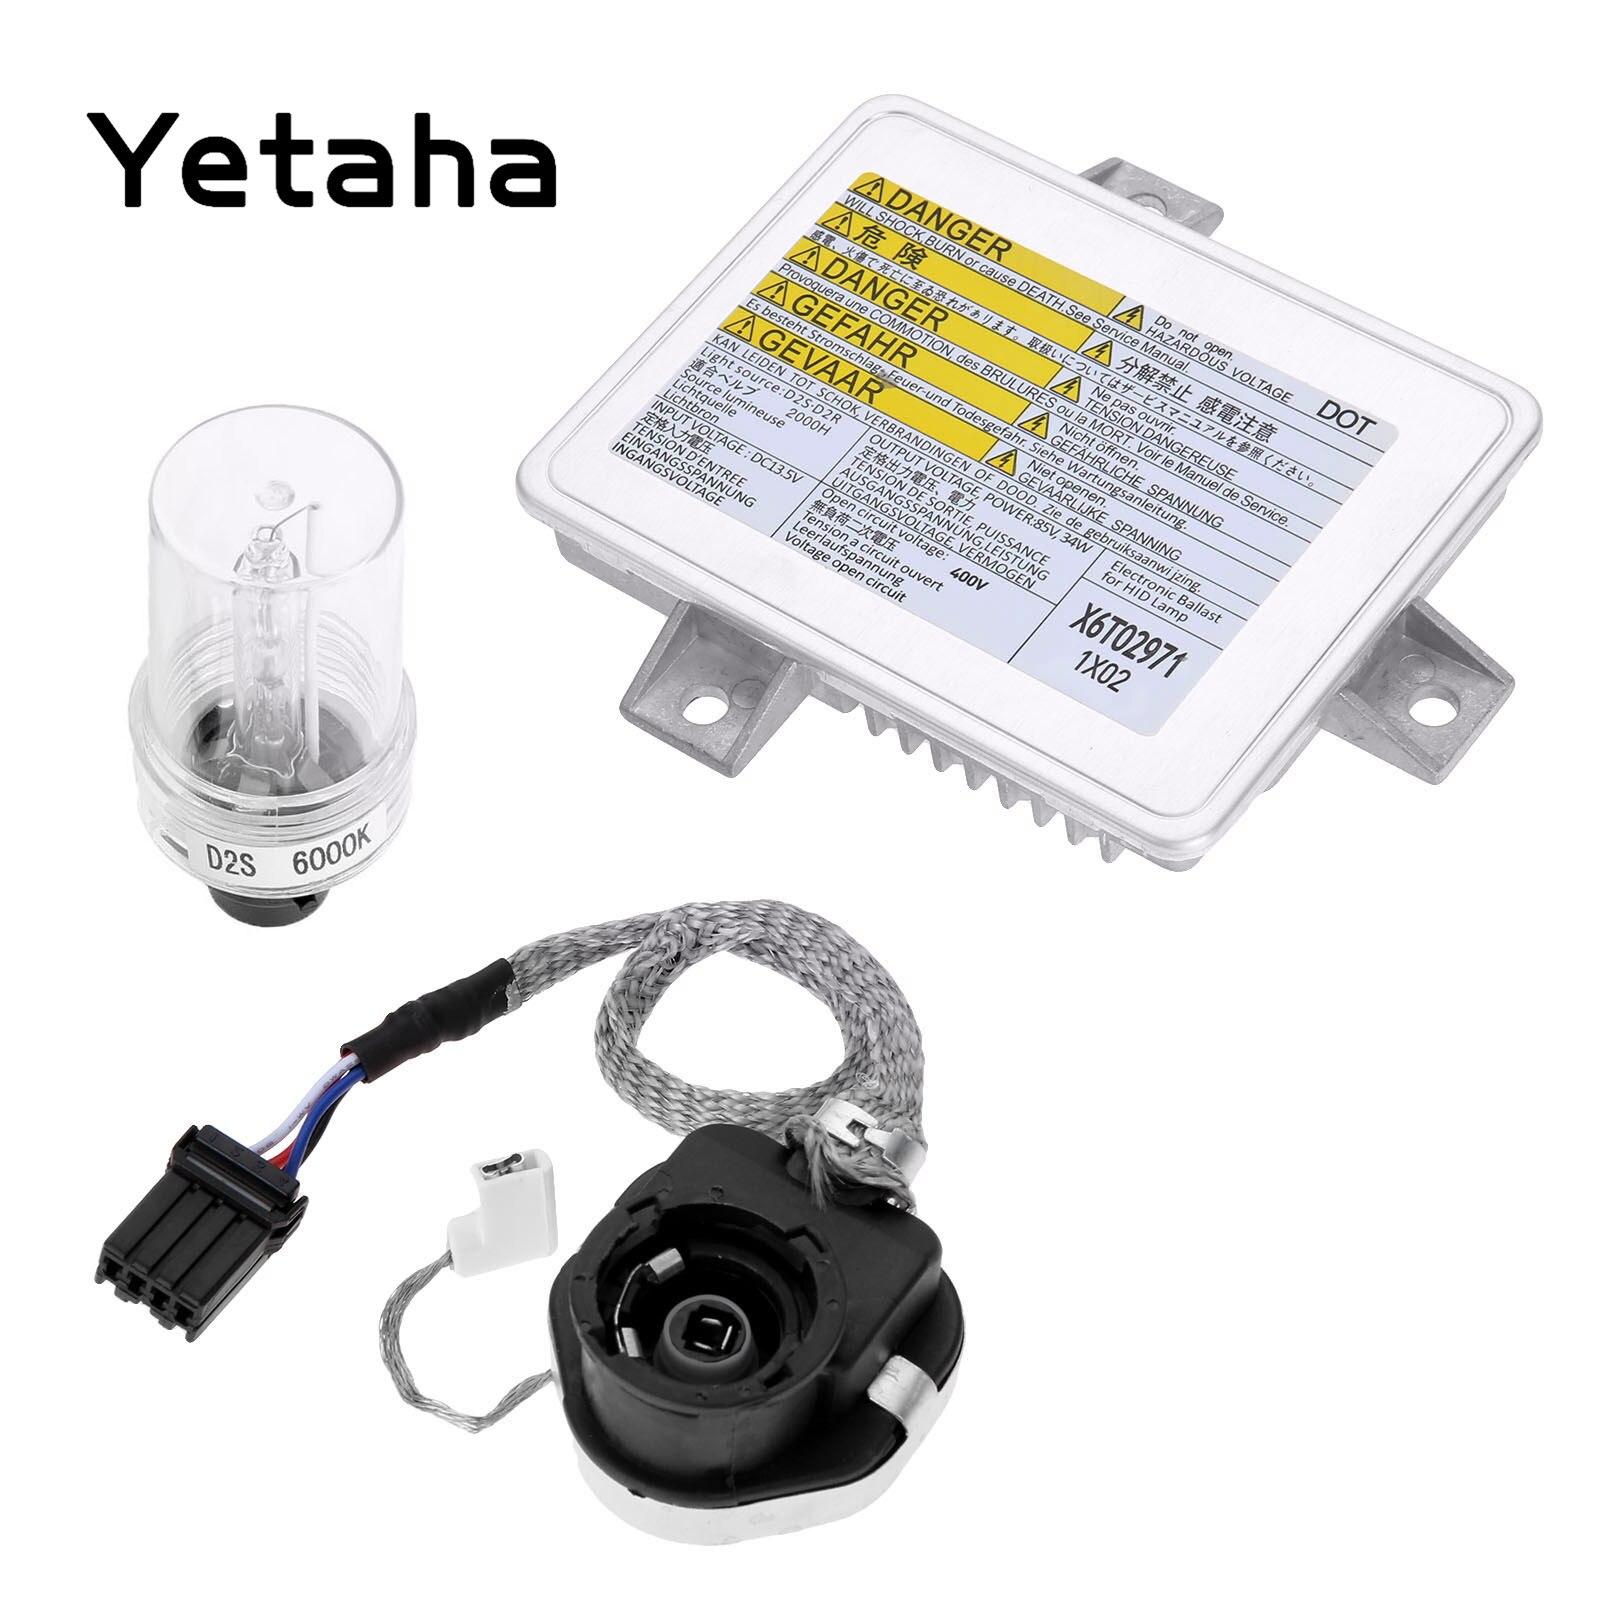 Yetaha Xenon HID Headlight Kit D2S D2R Ballast Igniter Control Starter Xenon Bulb X6T02971 W3T14371 For Acura TSX Honda Mazda 3 car light accessories amp d2s d2c d2r hid xenon cable adaptor socket for d2 d4 d4s d4r xenon hid headlight relay wiring harness